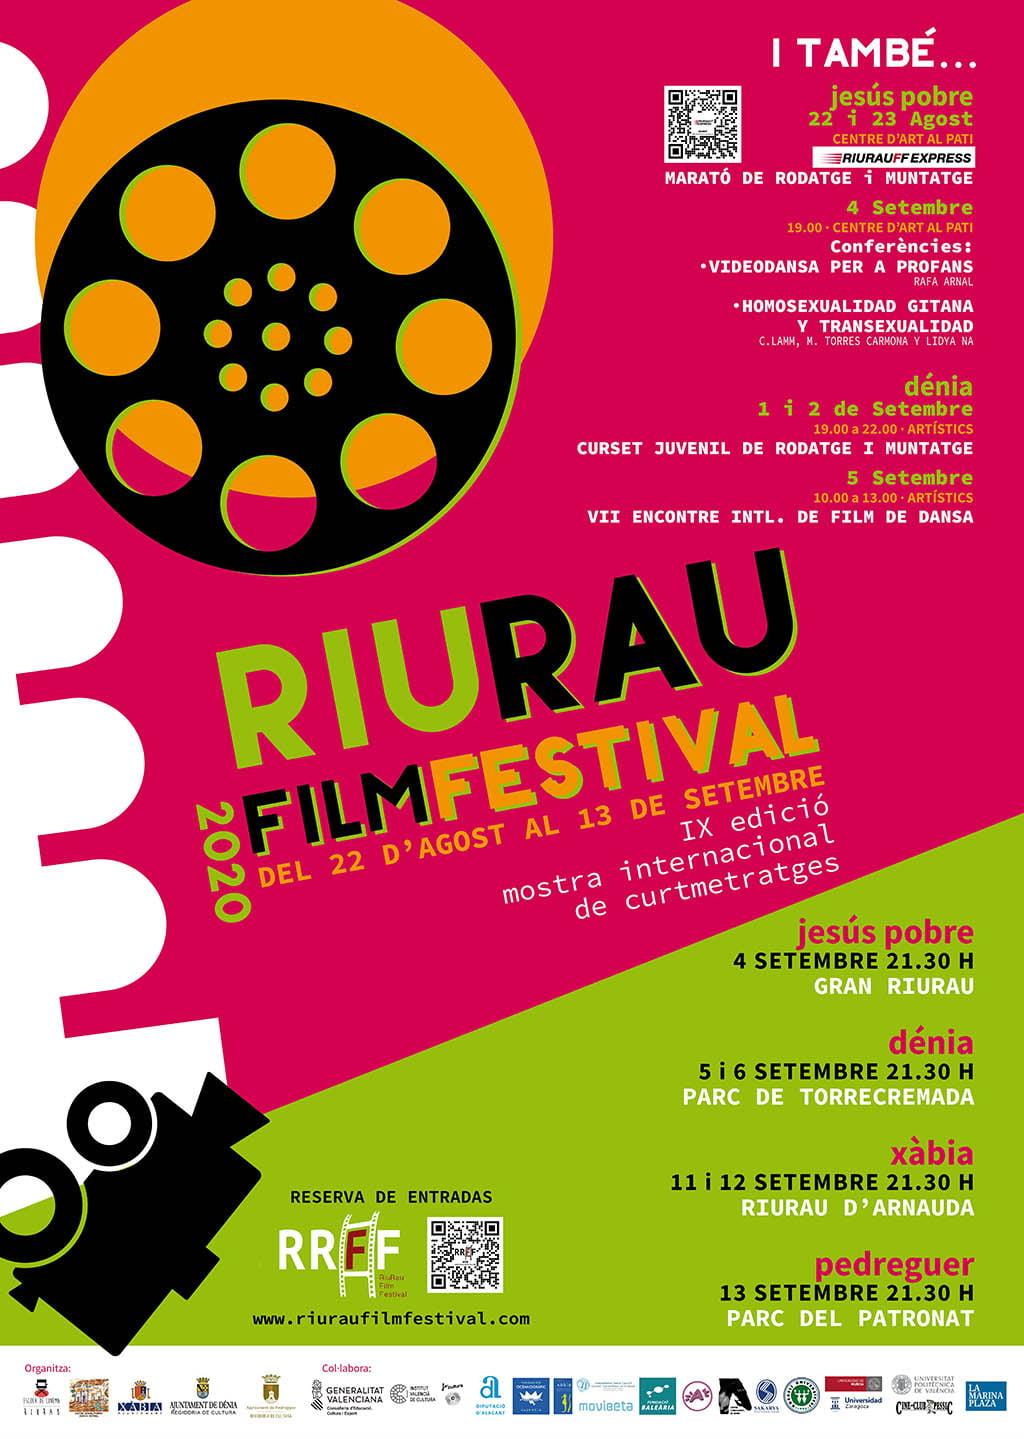 Cartel del Riurau Film Festival 2020